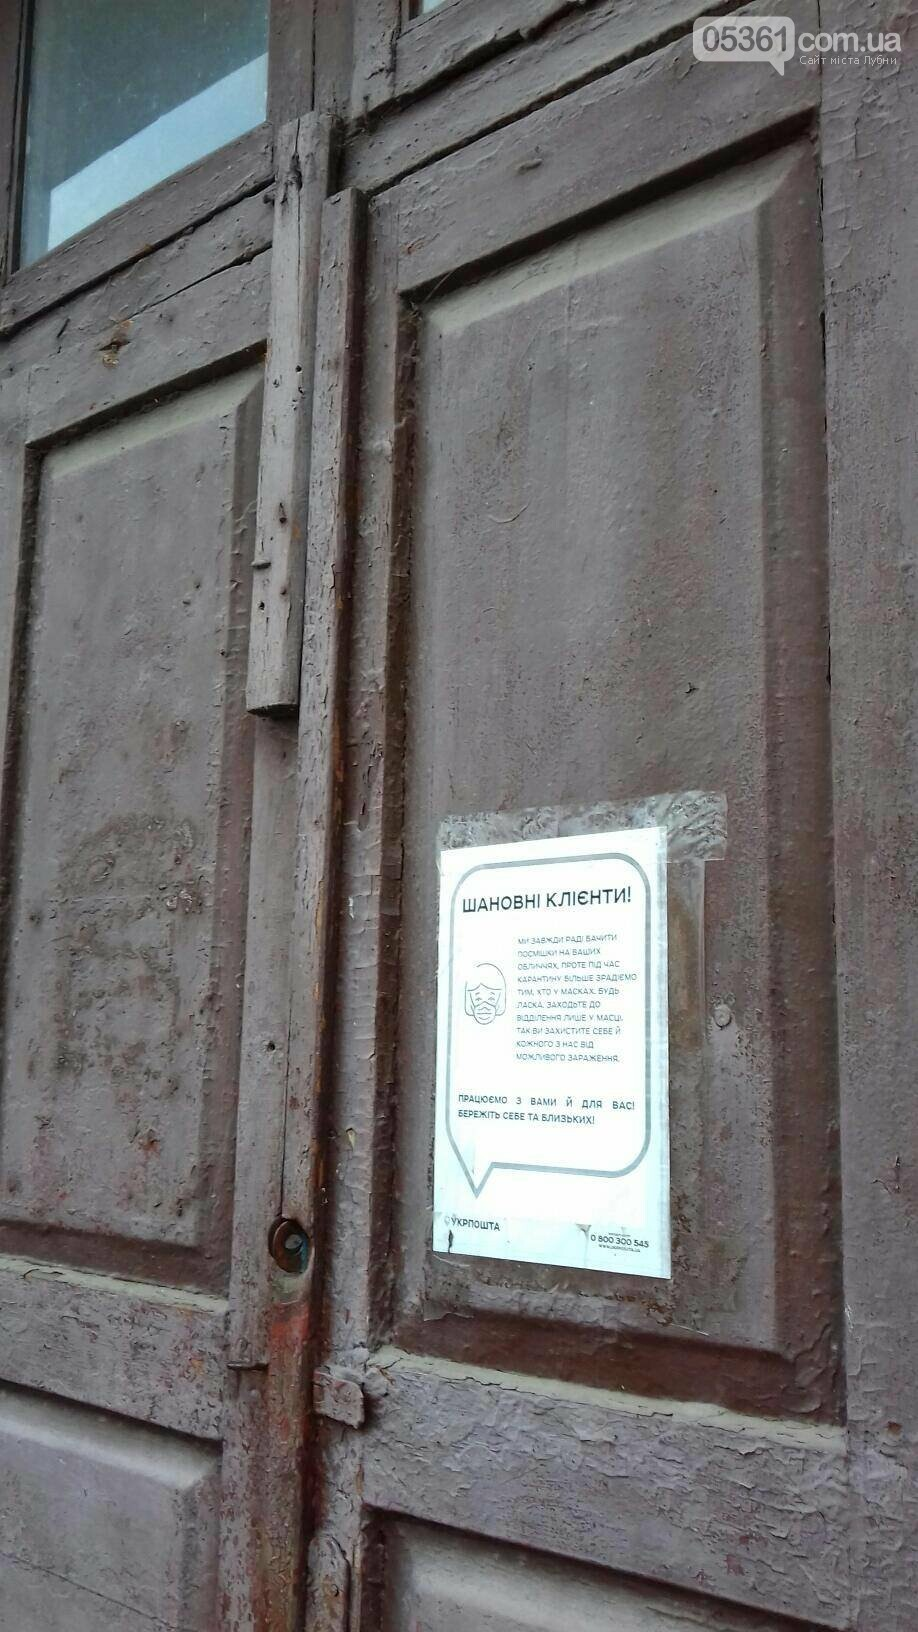 Капсули часу в Лубнах, фото-5